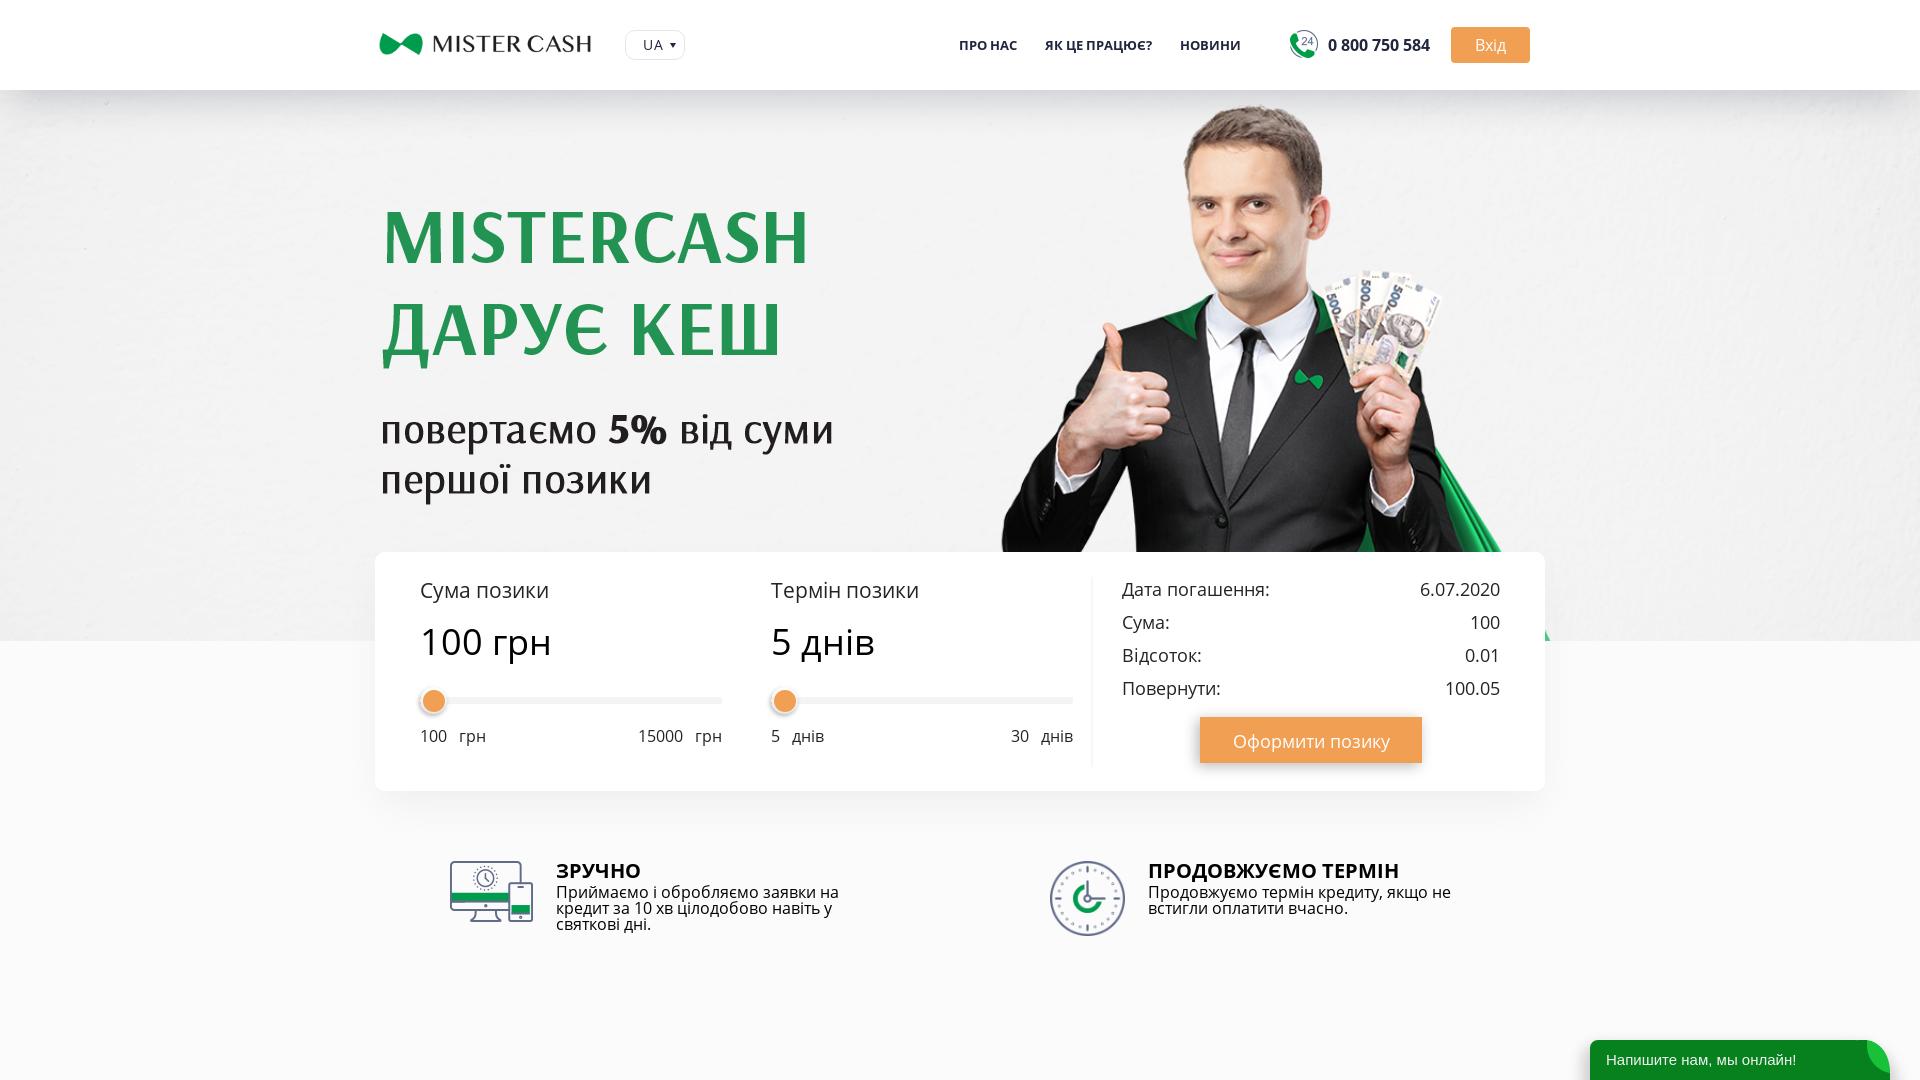 Mistercash [CPS] UA website